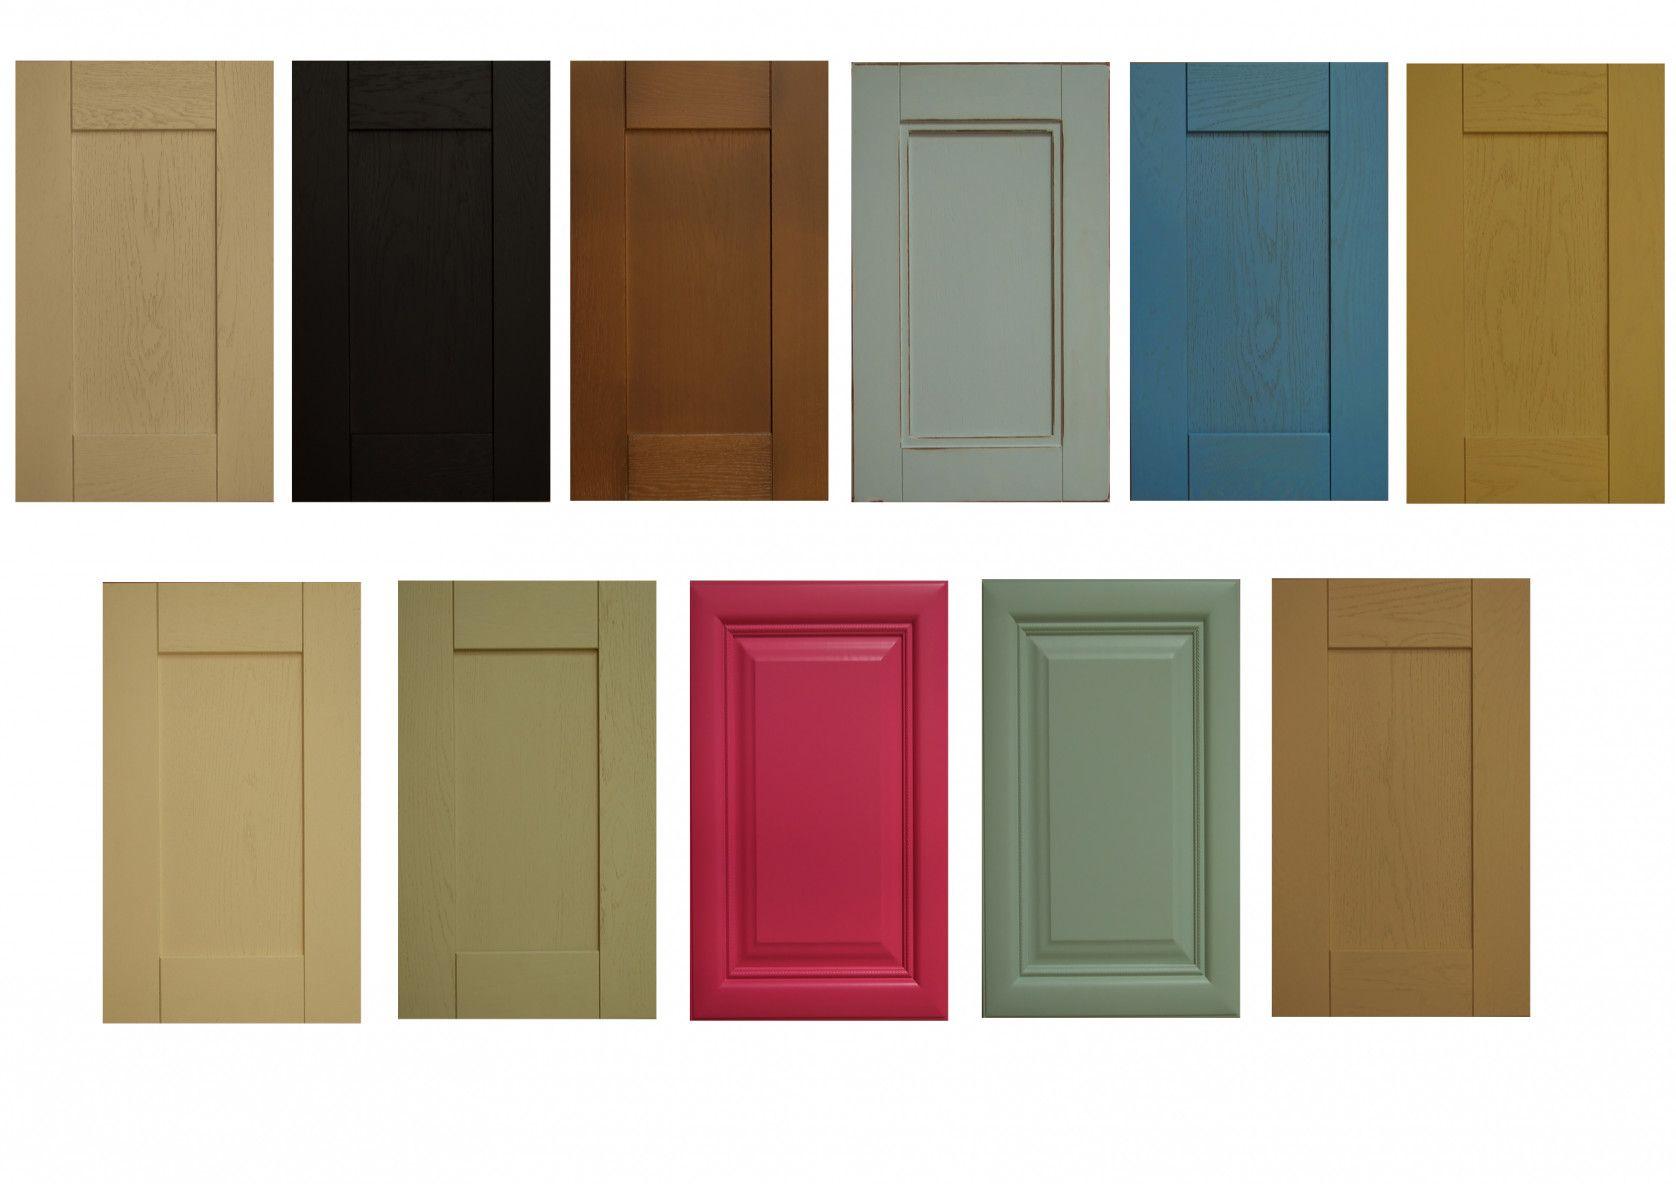 77 Mdf Cabinet Doors Home Depot Kitchen Cabinet Lighting Ideas